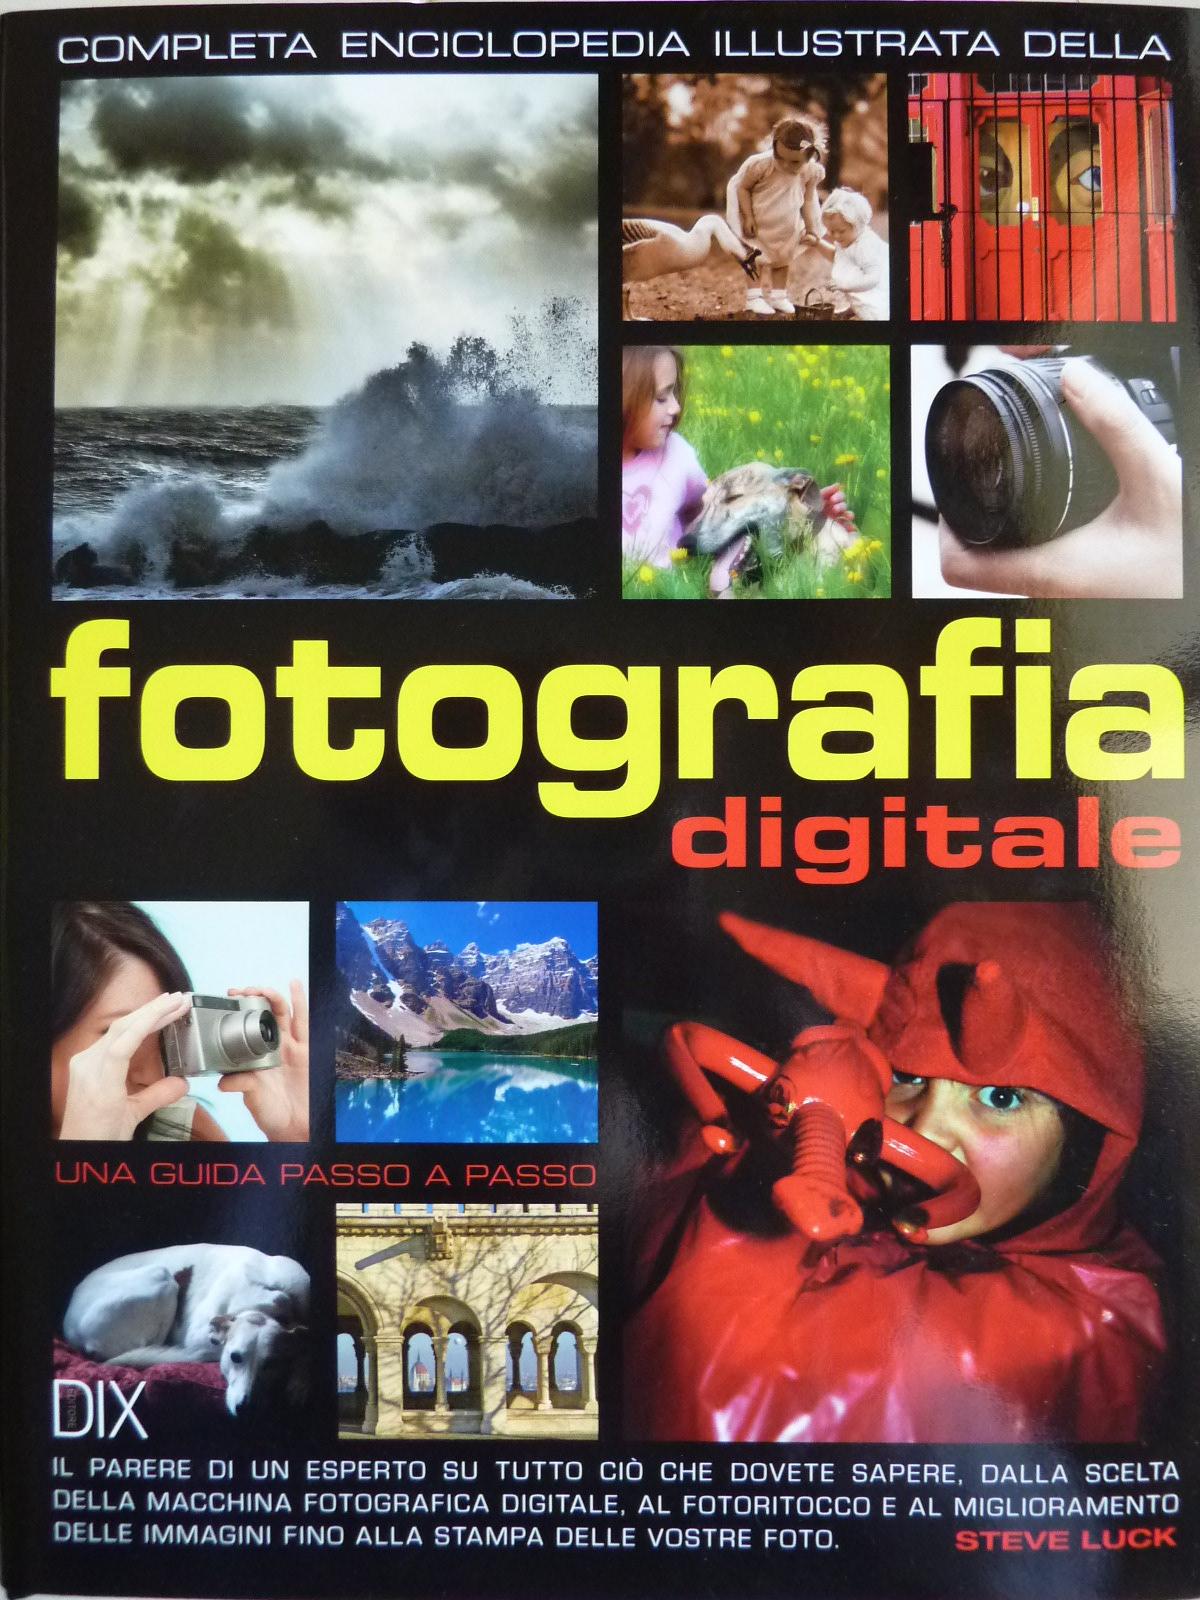 Completa enciclopedia illustrata della fotografia digitale